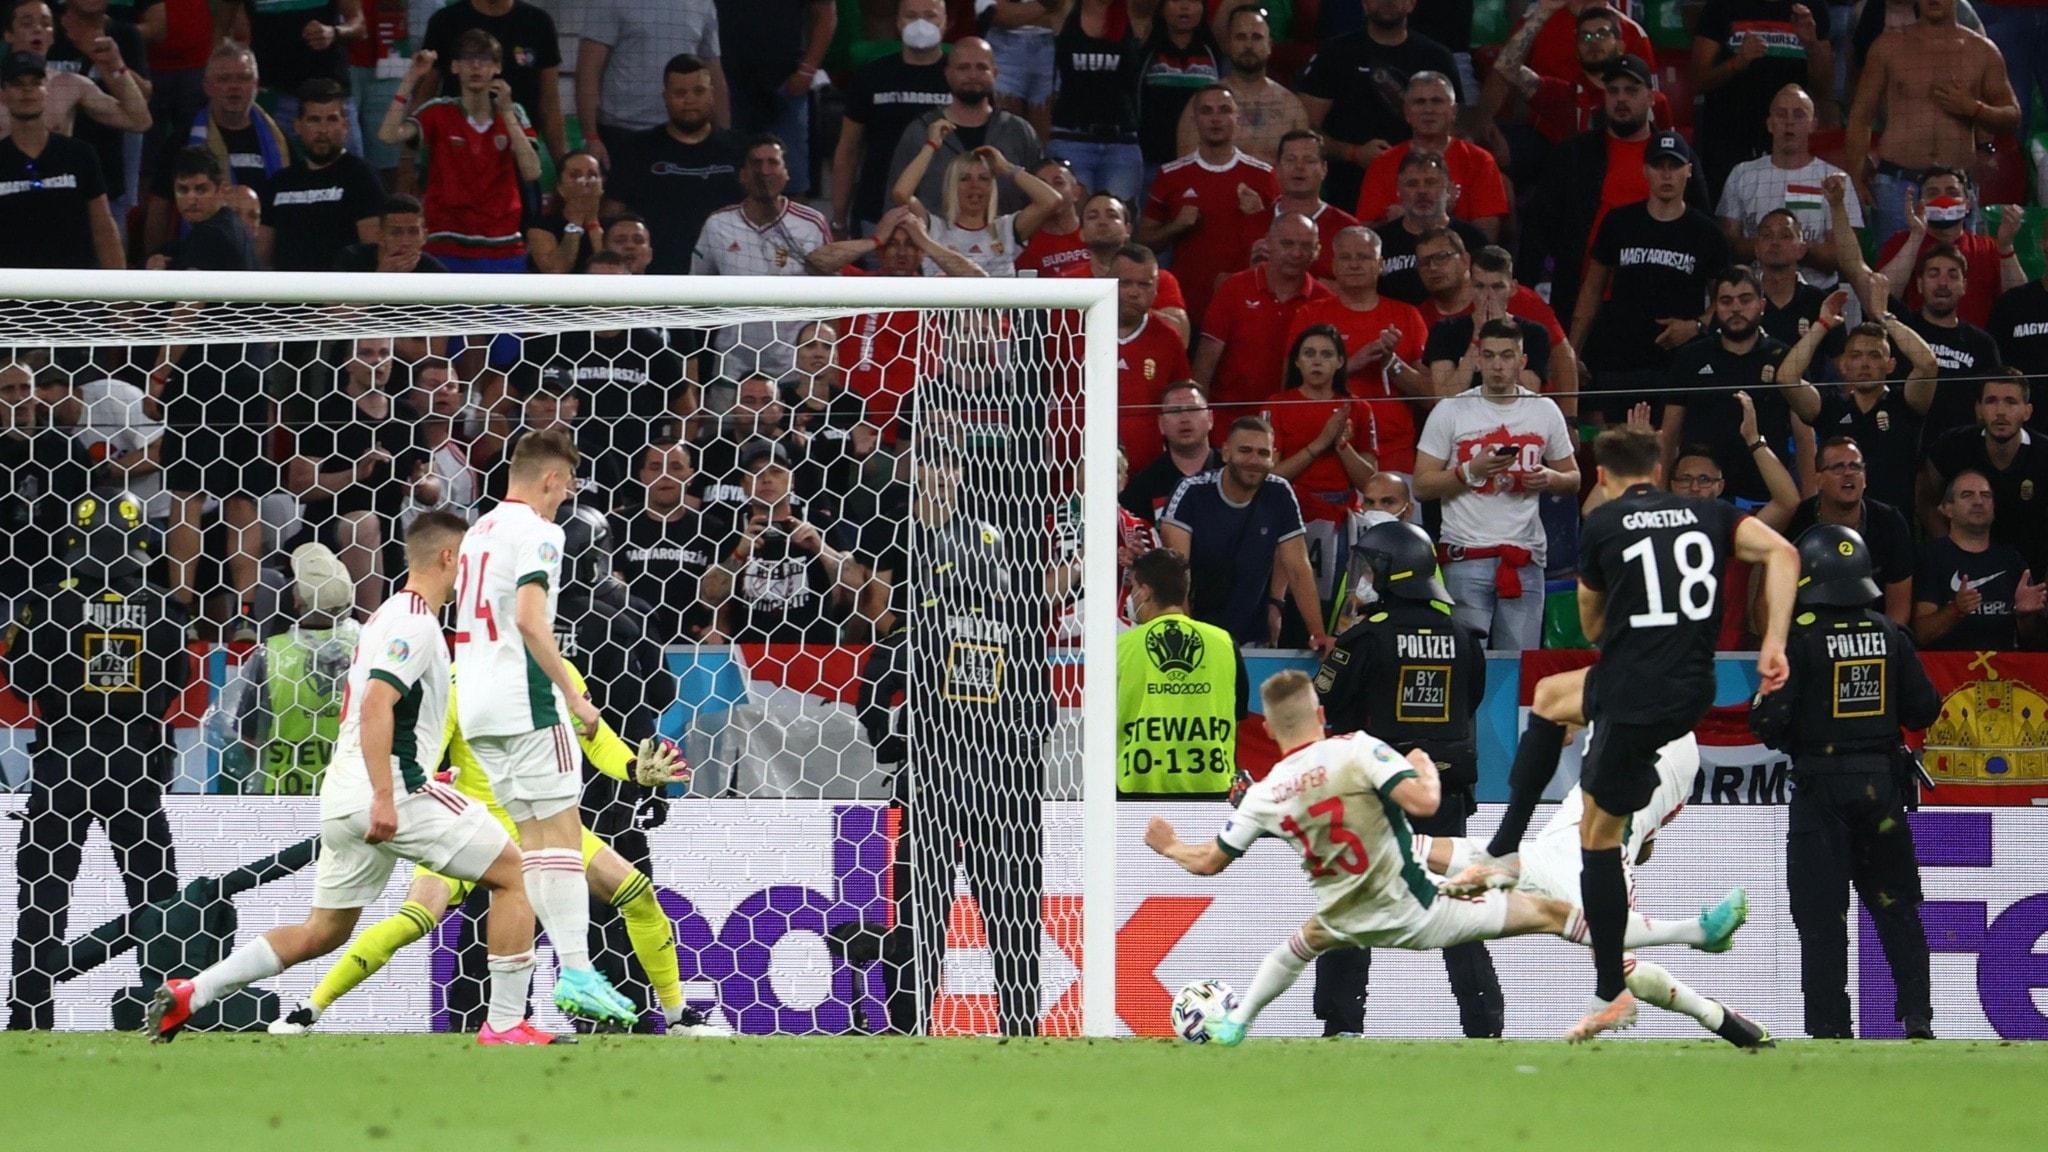 Uefa utreder uppgifter om homofobiska EM-ramsor